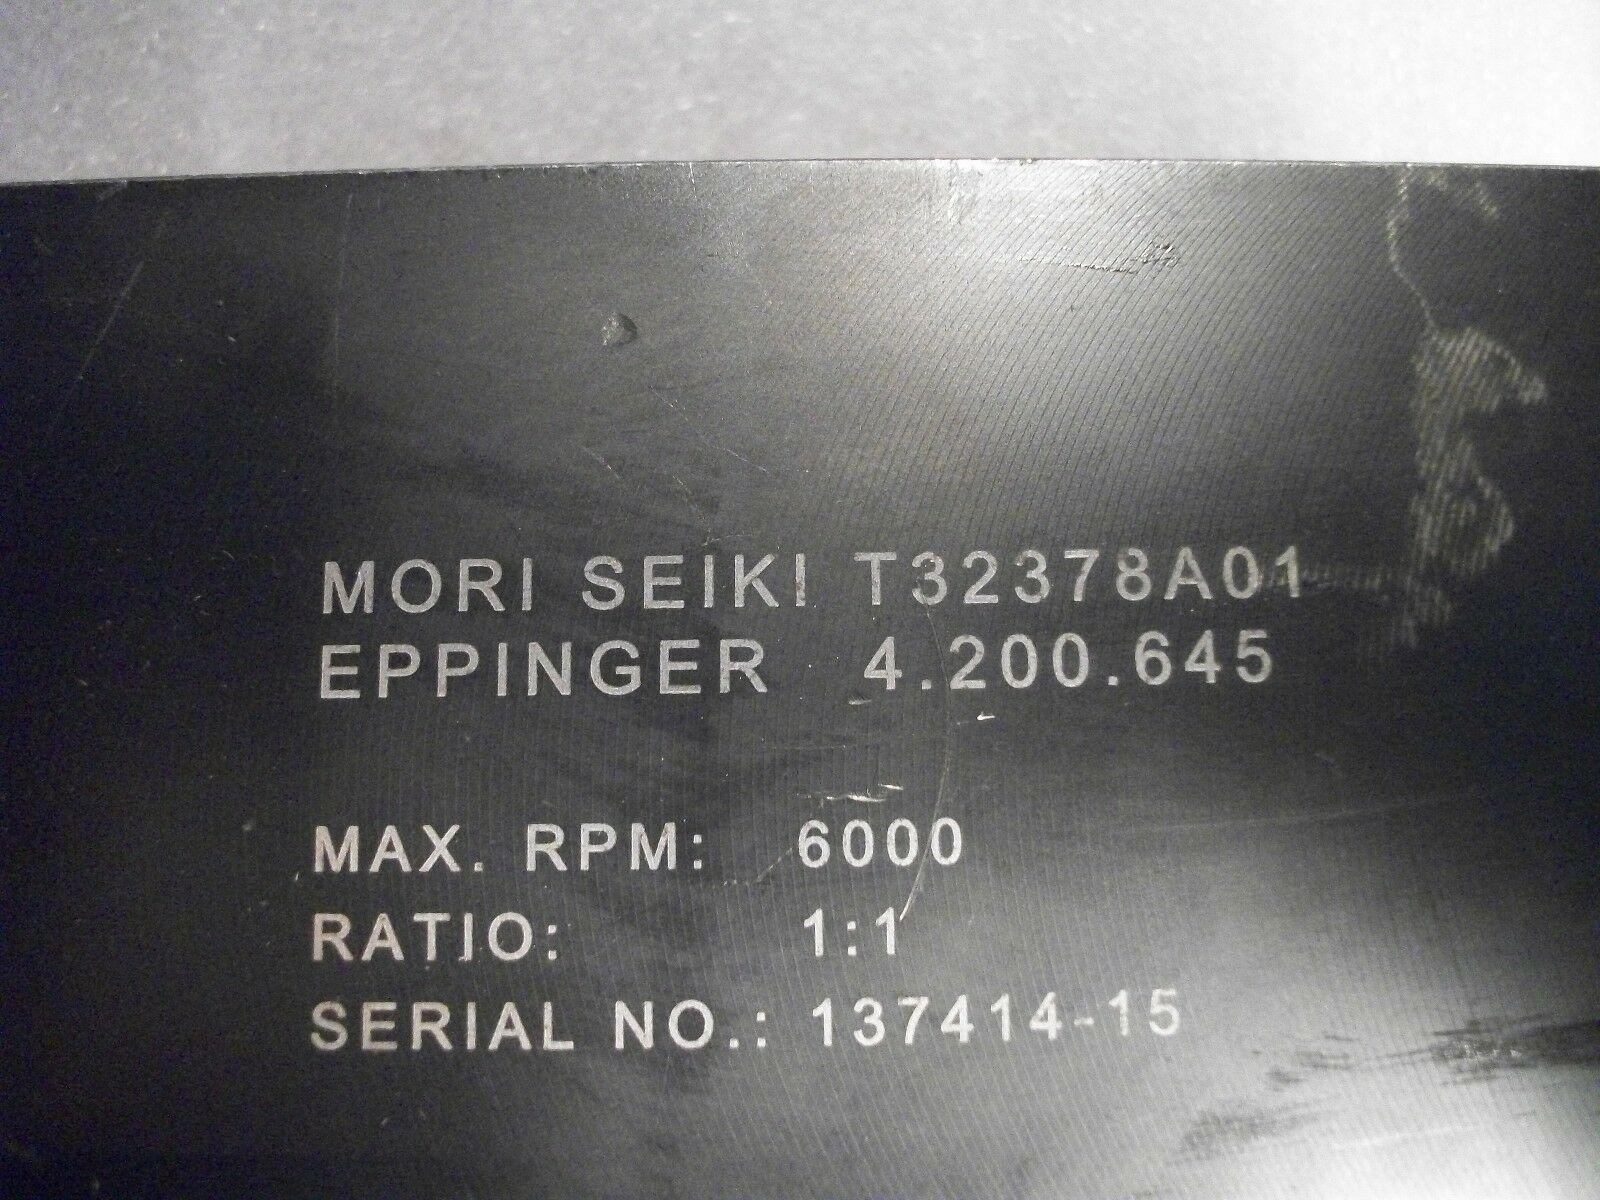 Mori Seiki Right Angle LIVE TOOLHOLDER 4.200.645, ER40, T32378A01